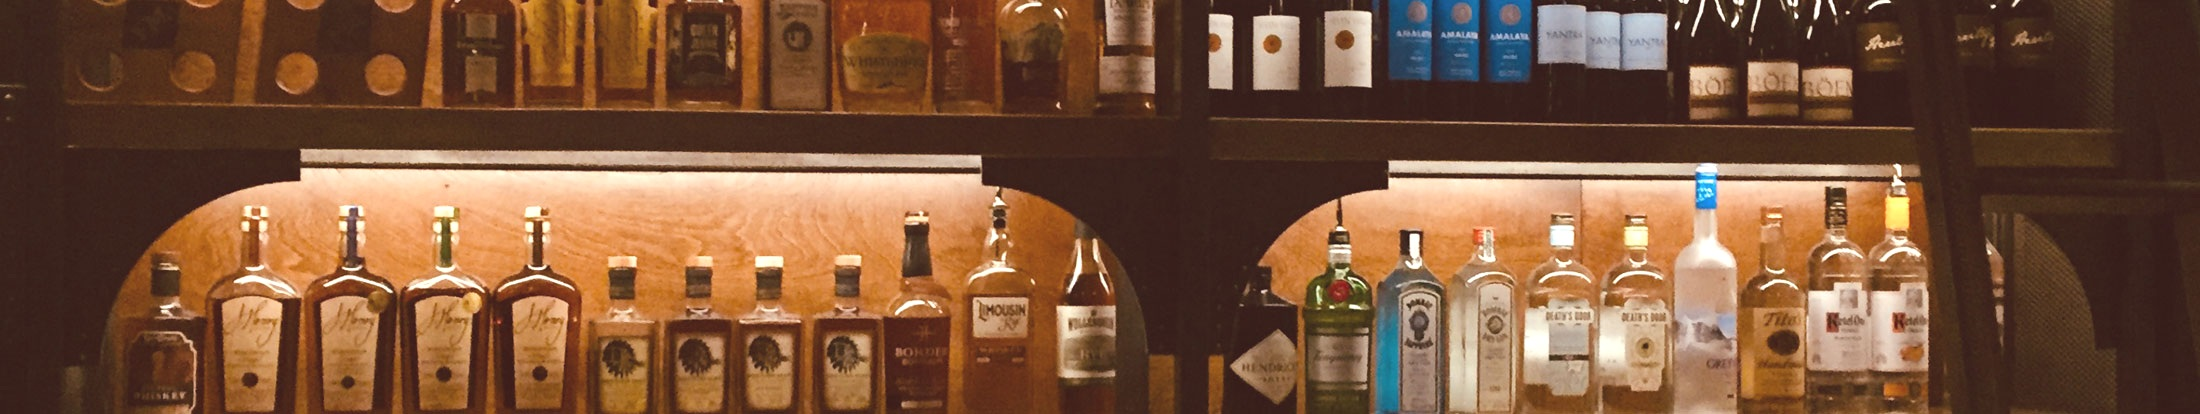 wine_spirits_menu_header.jpg